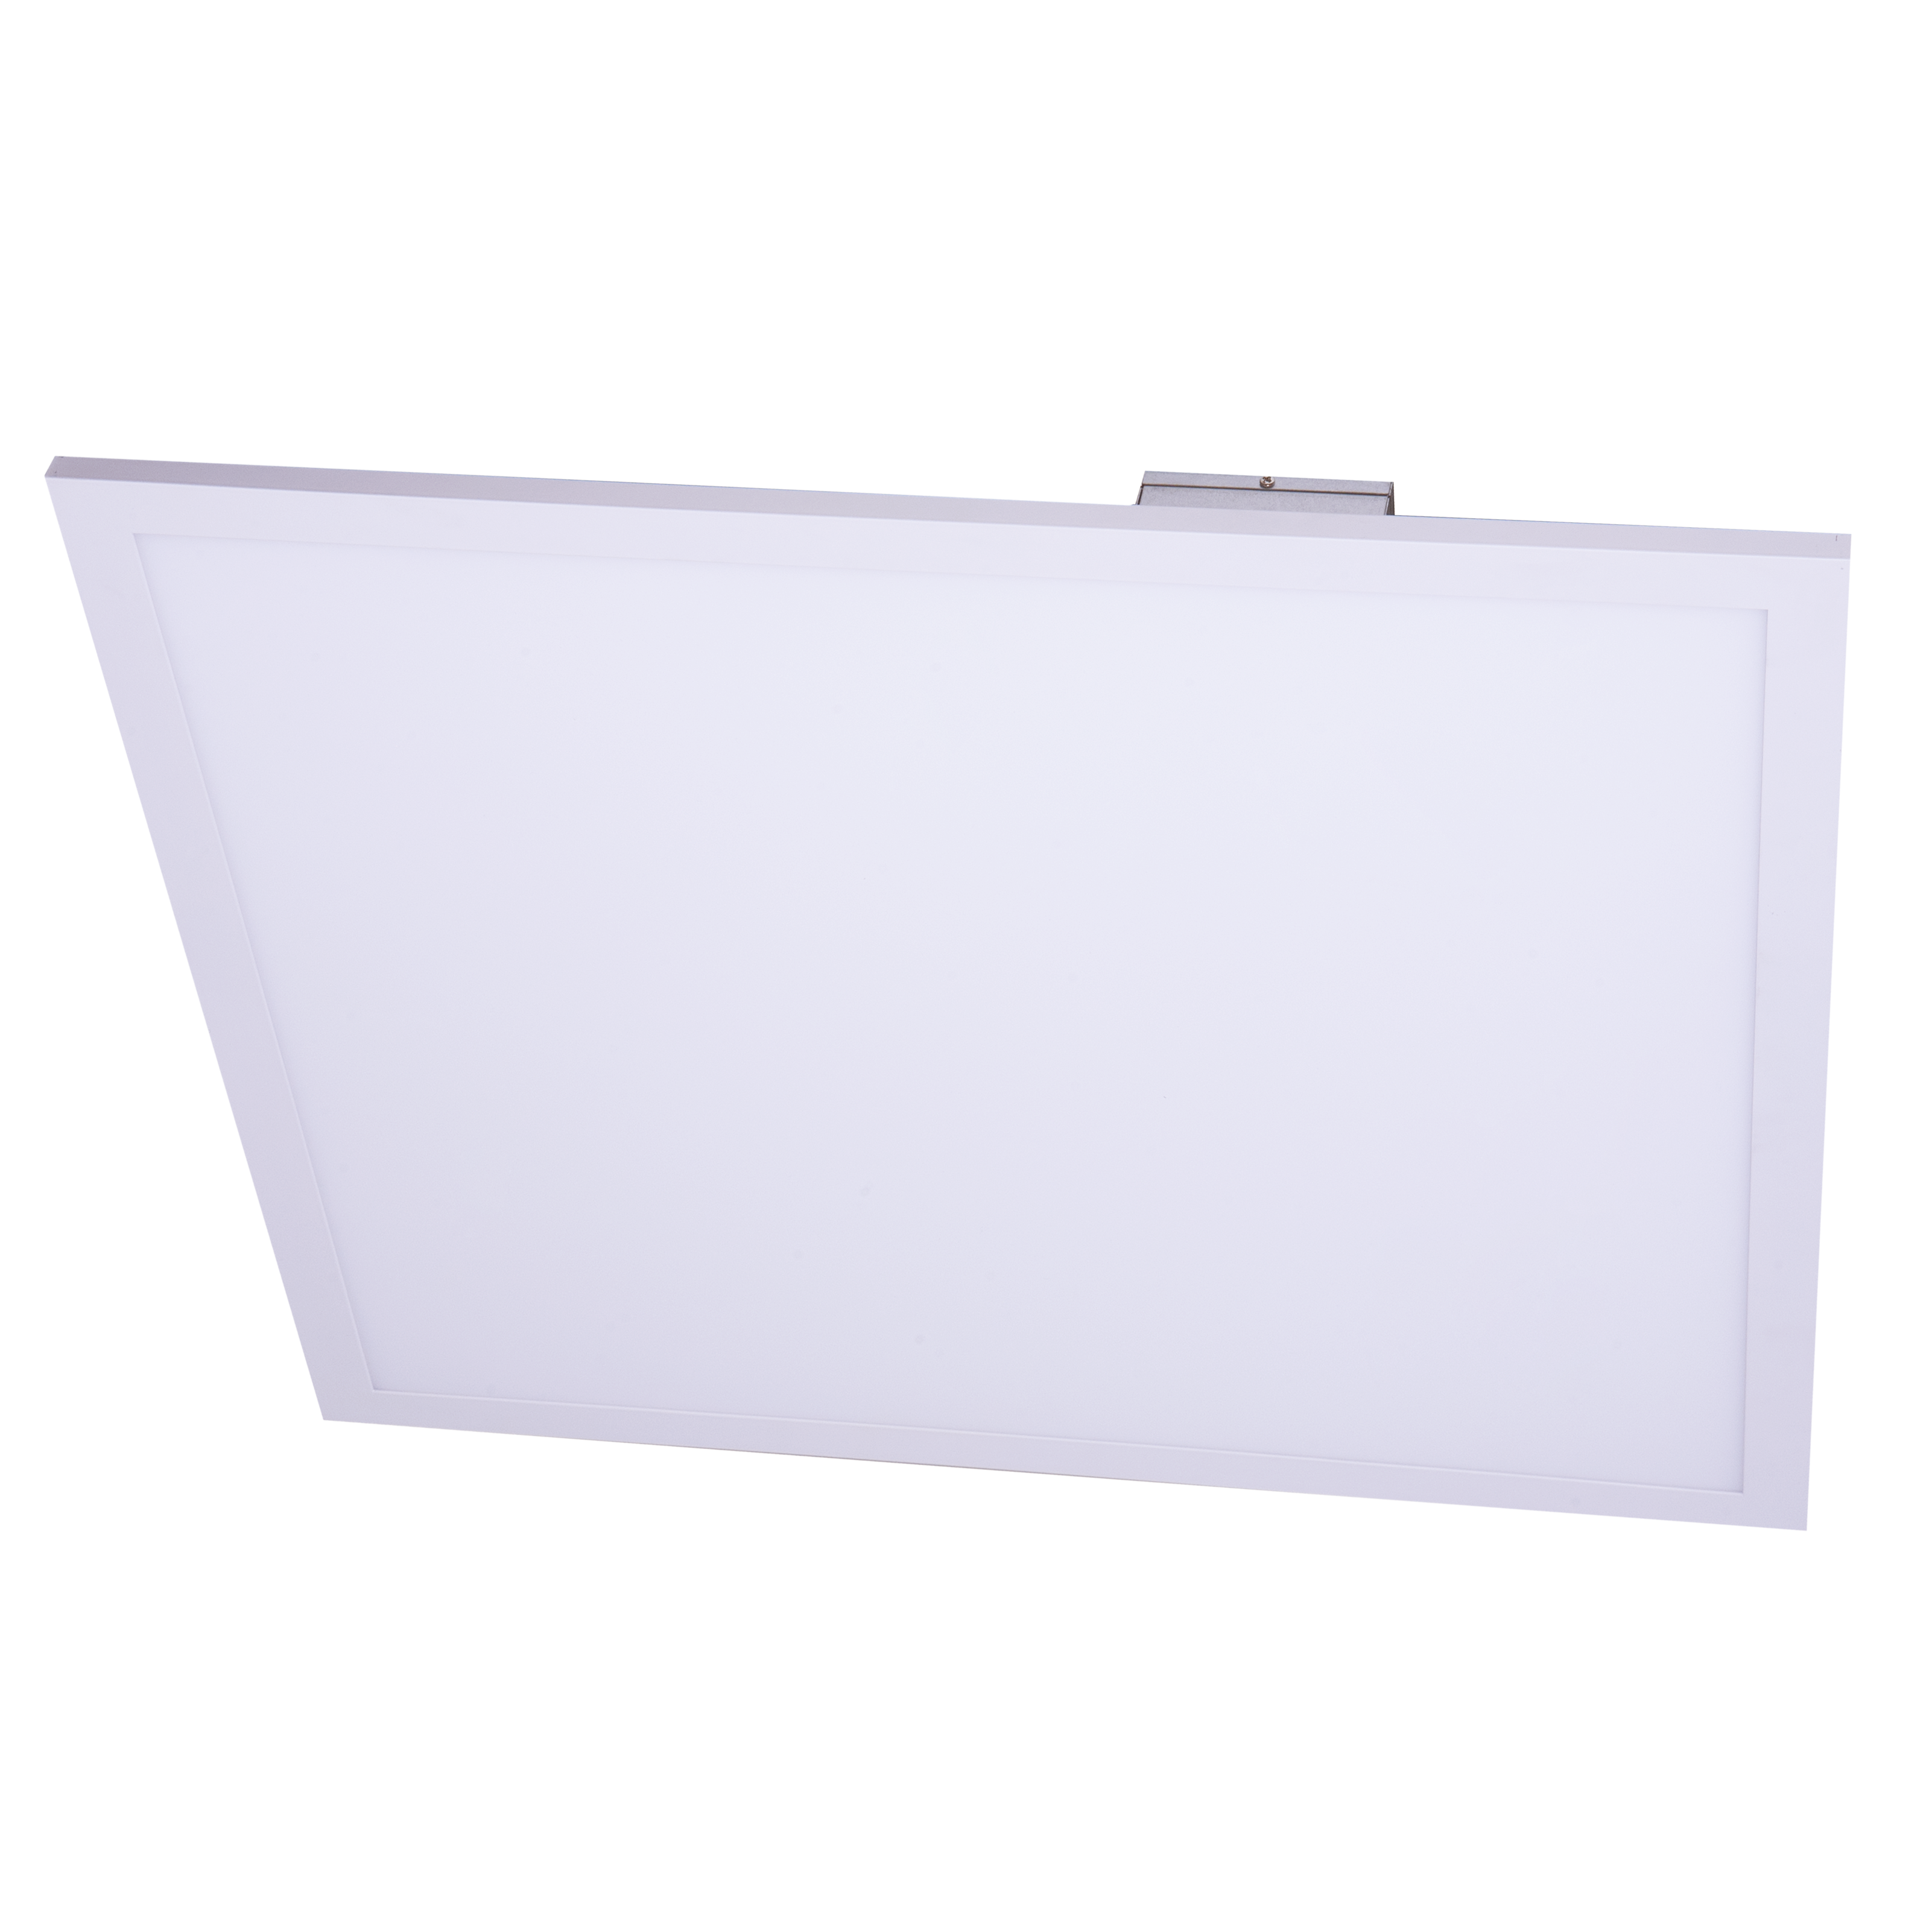 Led Flat Panel E Tfp Series 4000k 2 X 2 White Paneling Led Meditation Room